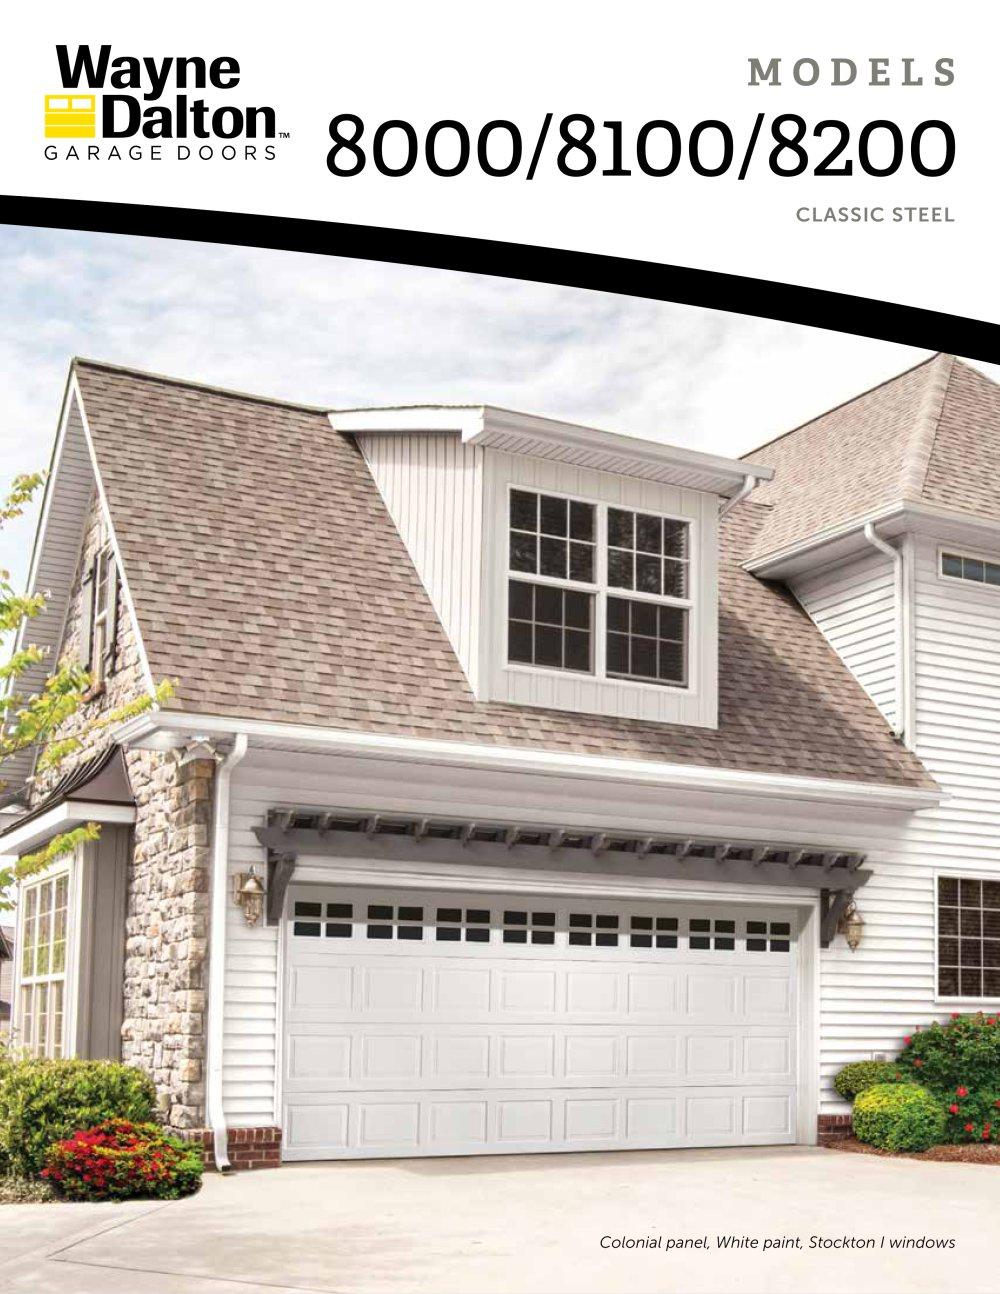 r stockton insulated doors garage ranch buckeye high stocktonii ii with door windows value dalton black wayne